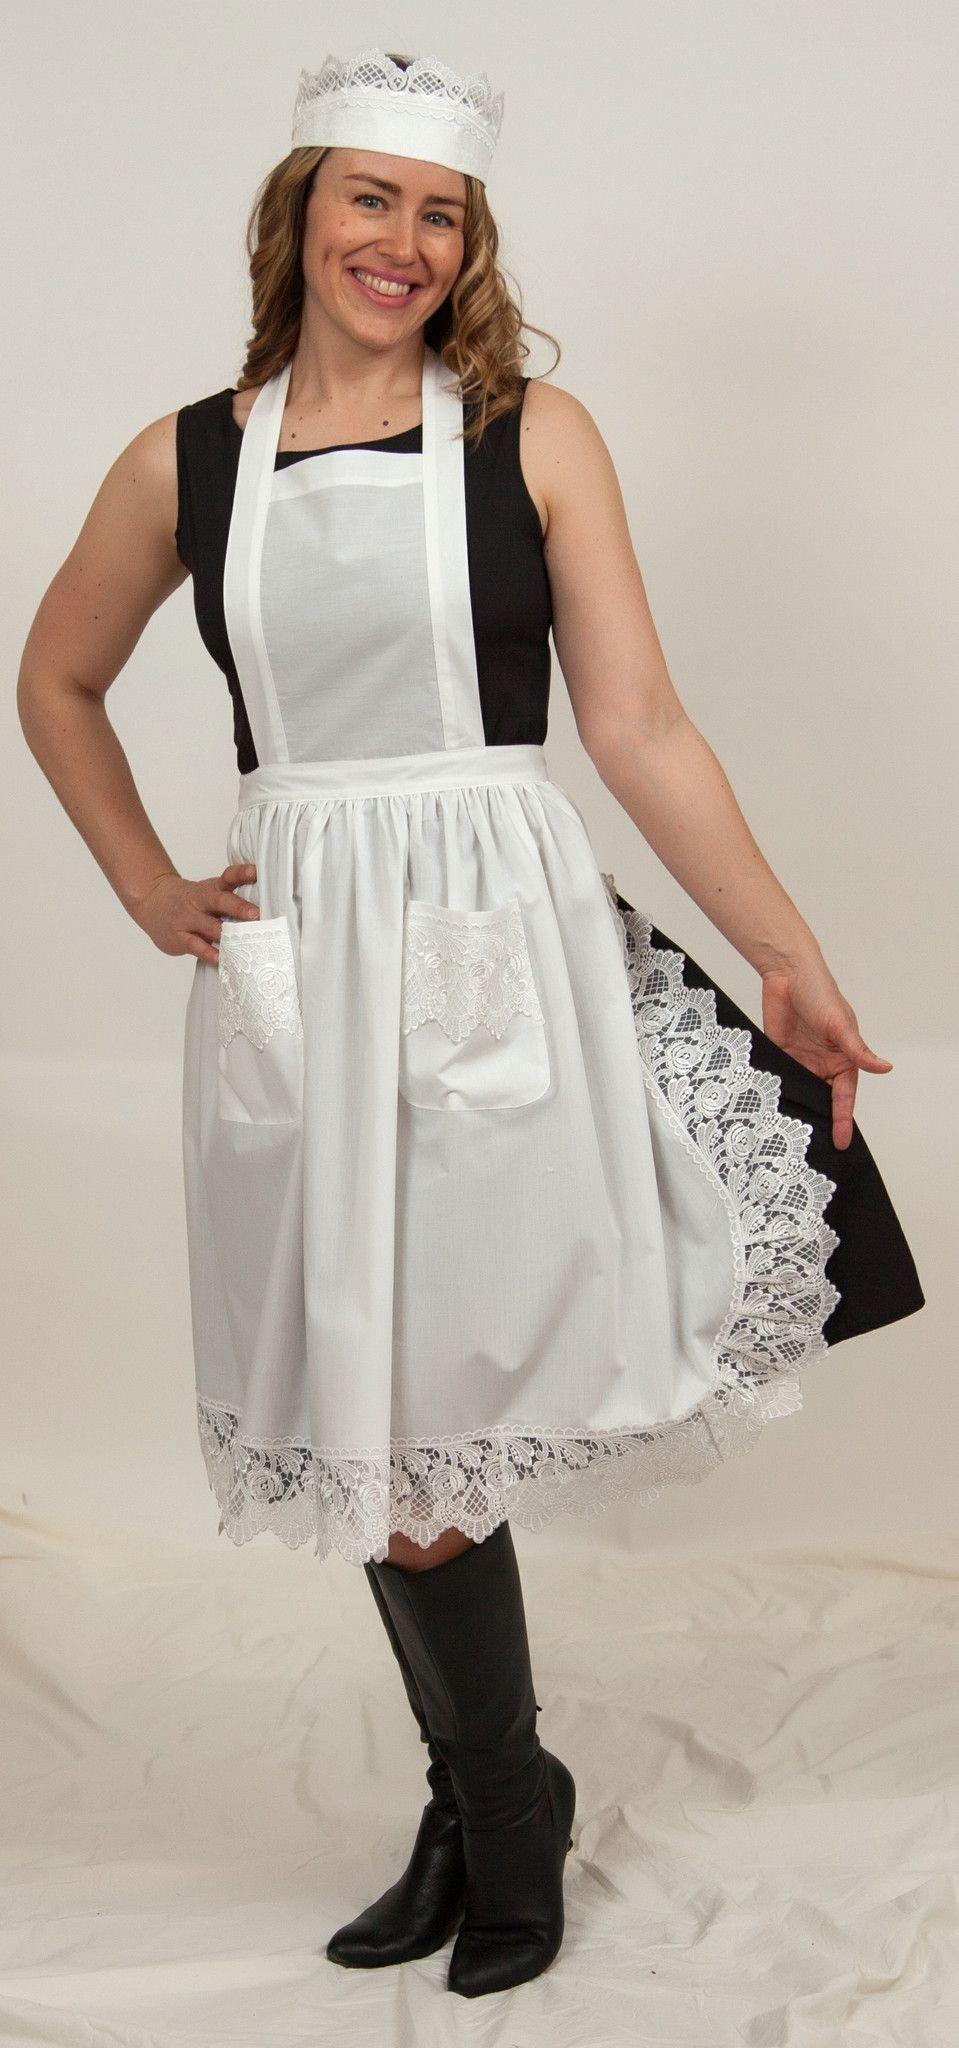 White apron costume -  Maid Costume White Lace Headband And Adult Full Lace Apron Costume